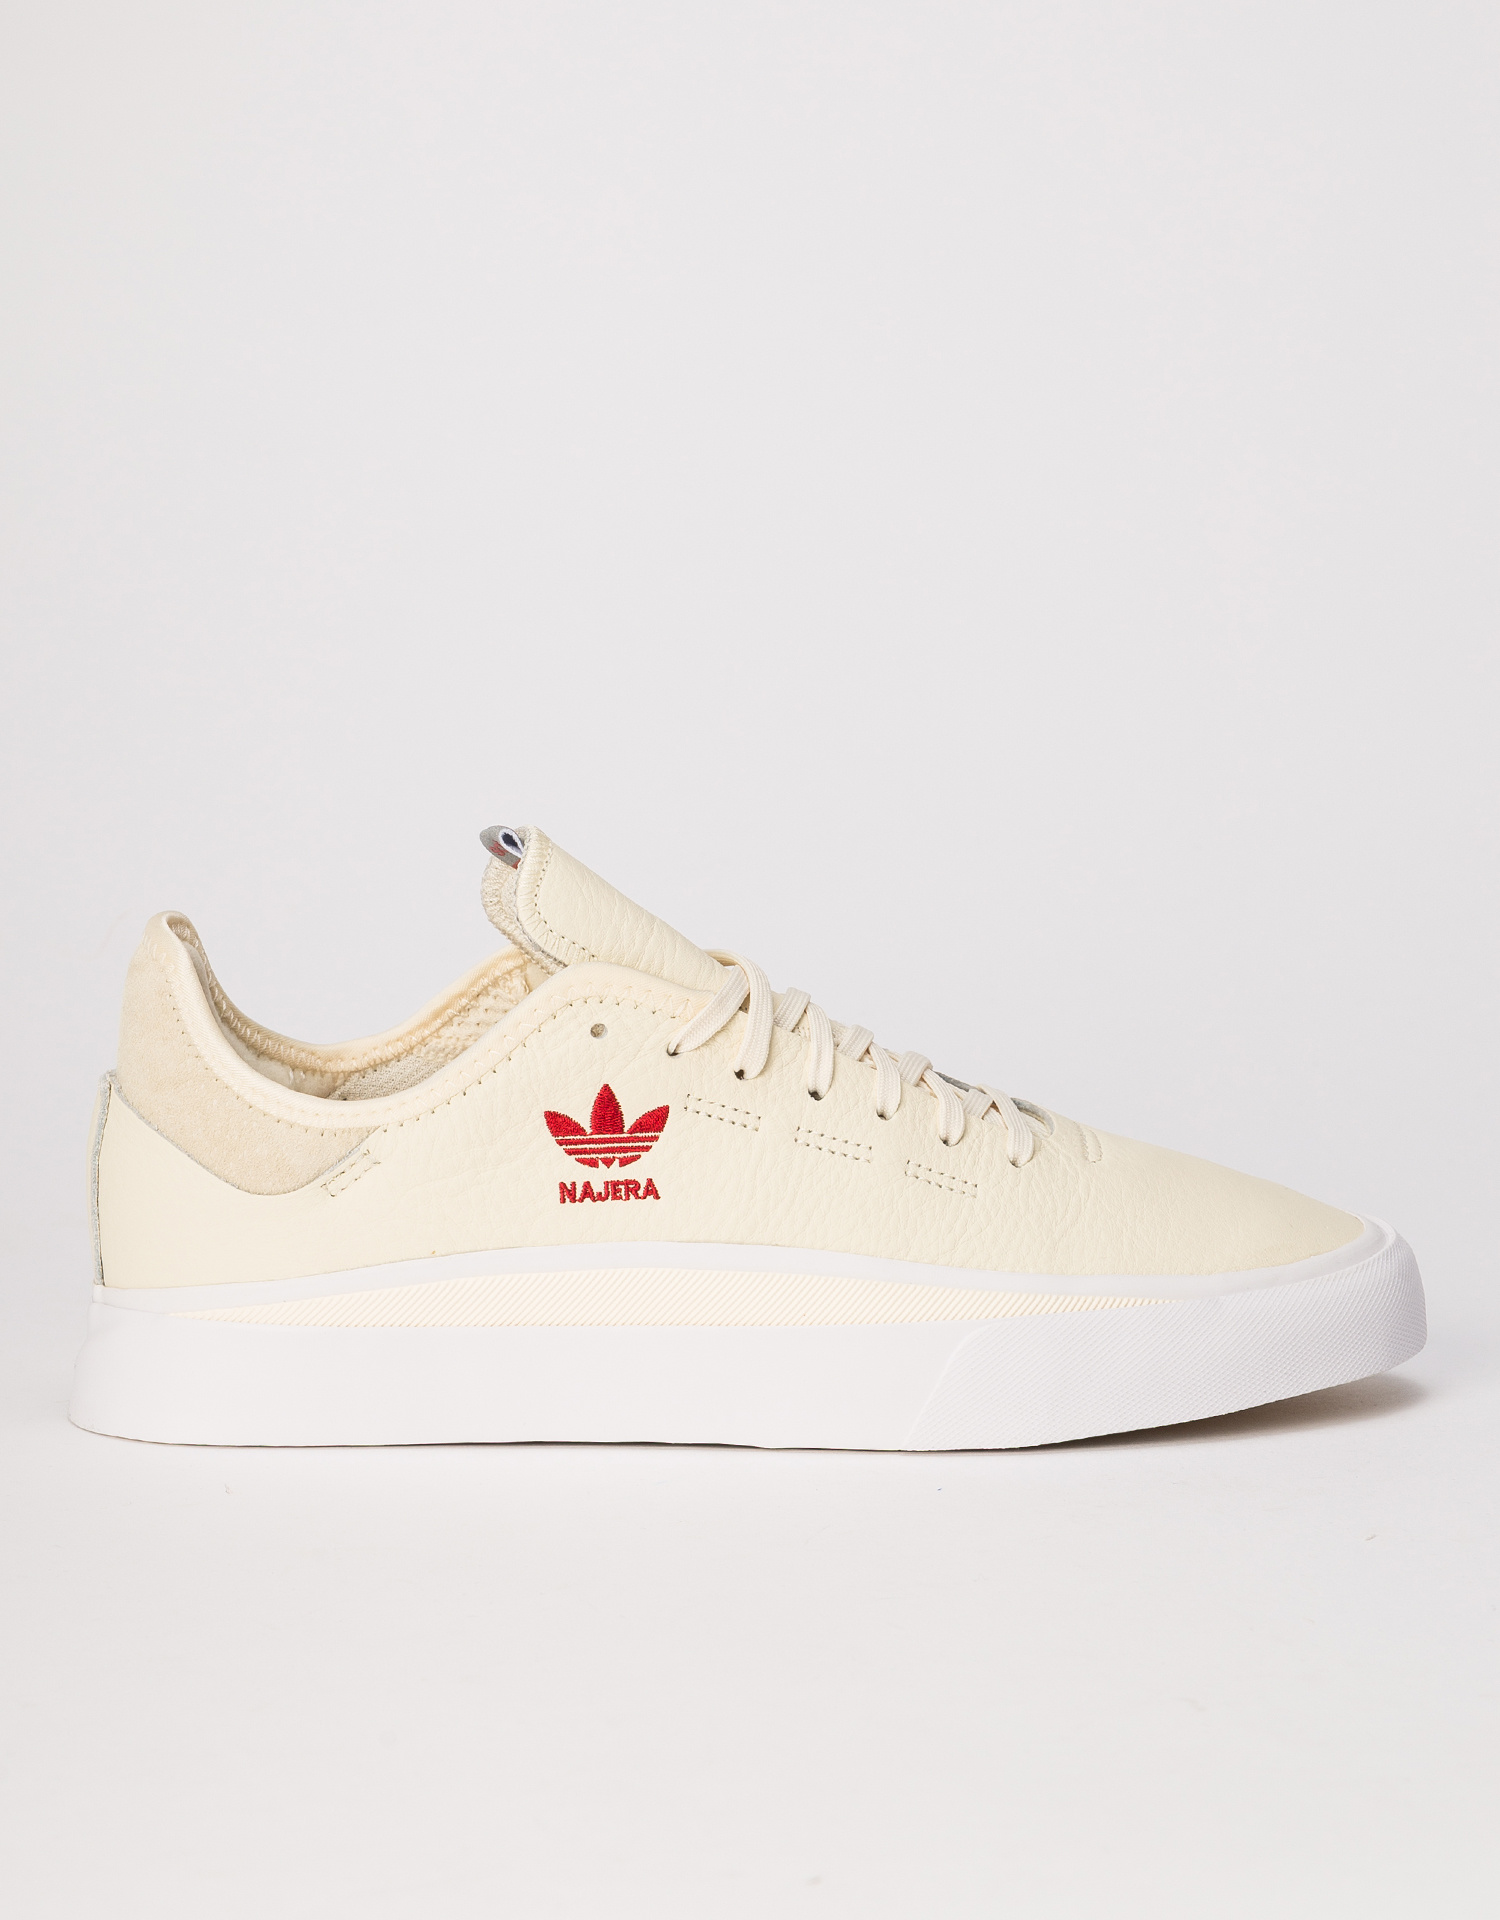 Adidas sabalo cwhite/ftwwht/powred